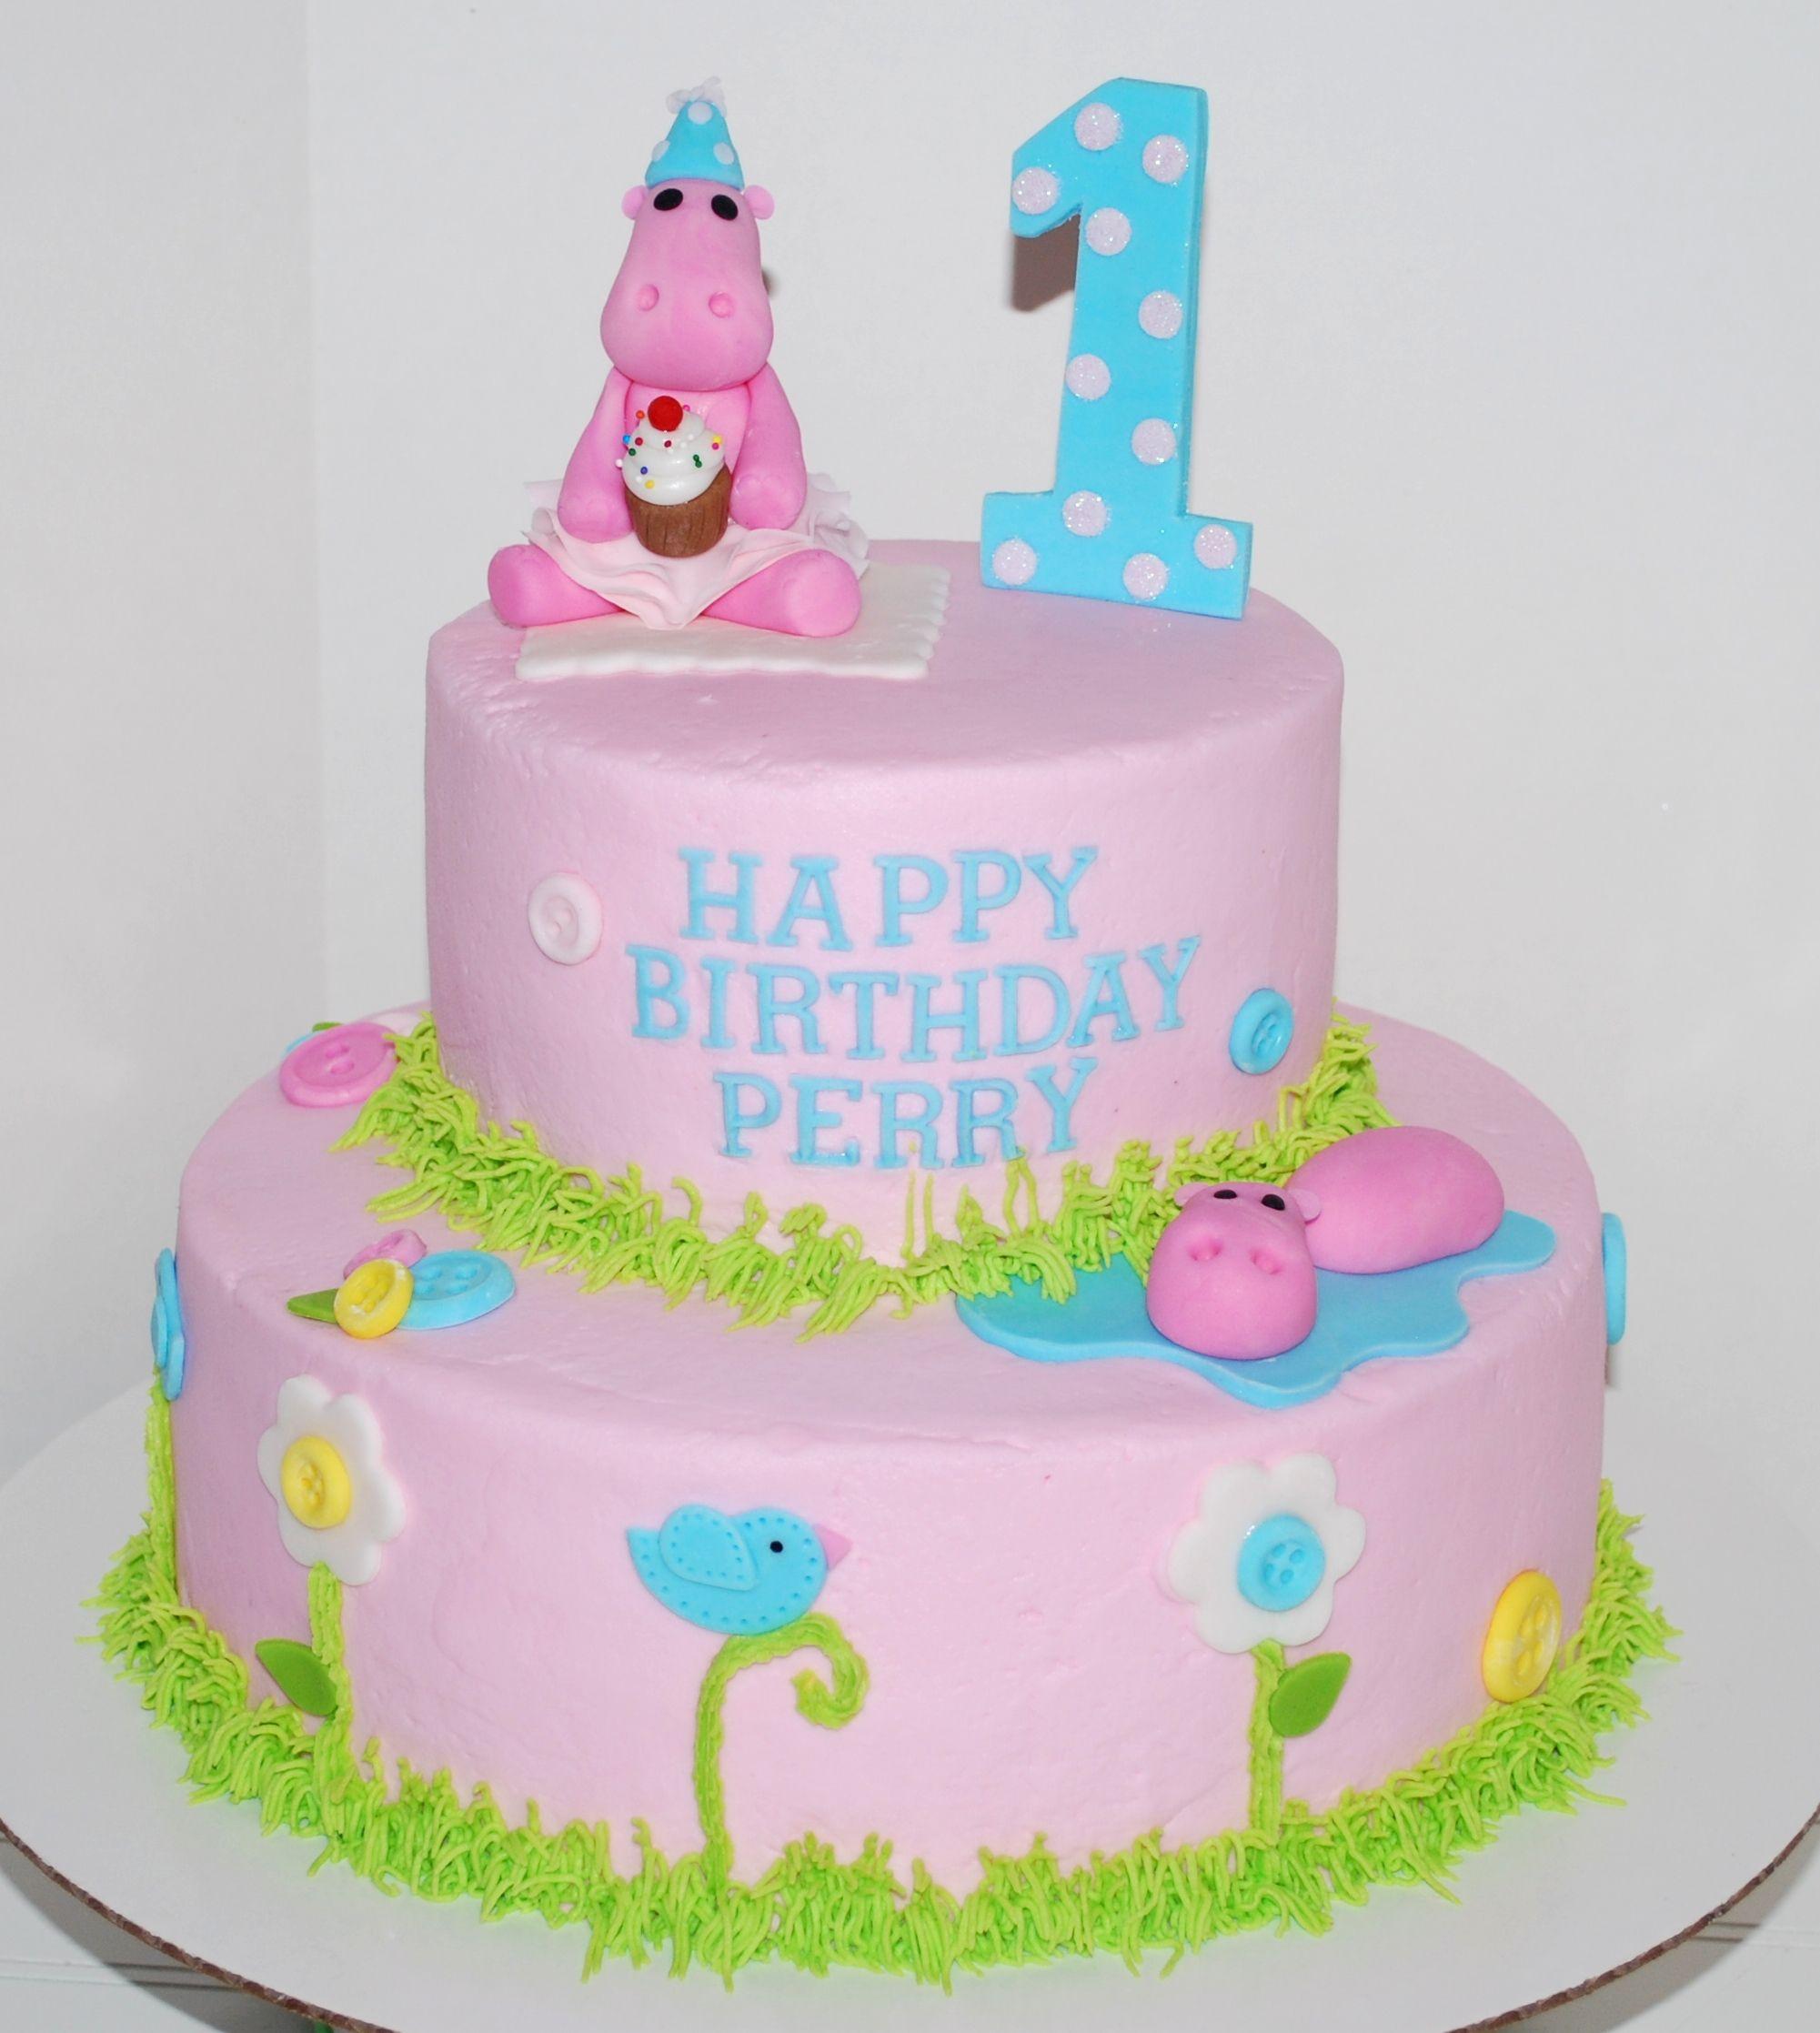 Pink Hippo Cake Nutmeg Confections Cakes I Have Made Nutmeg